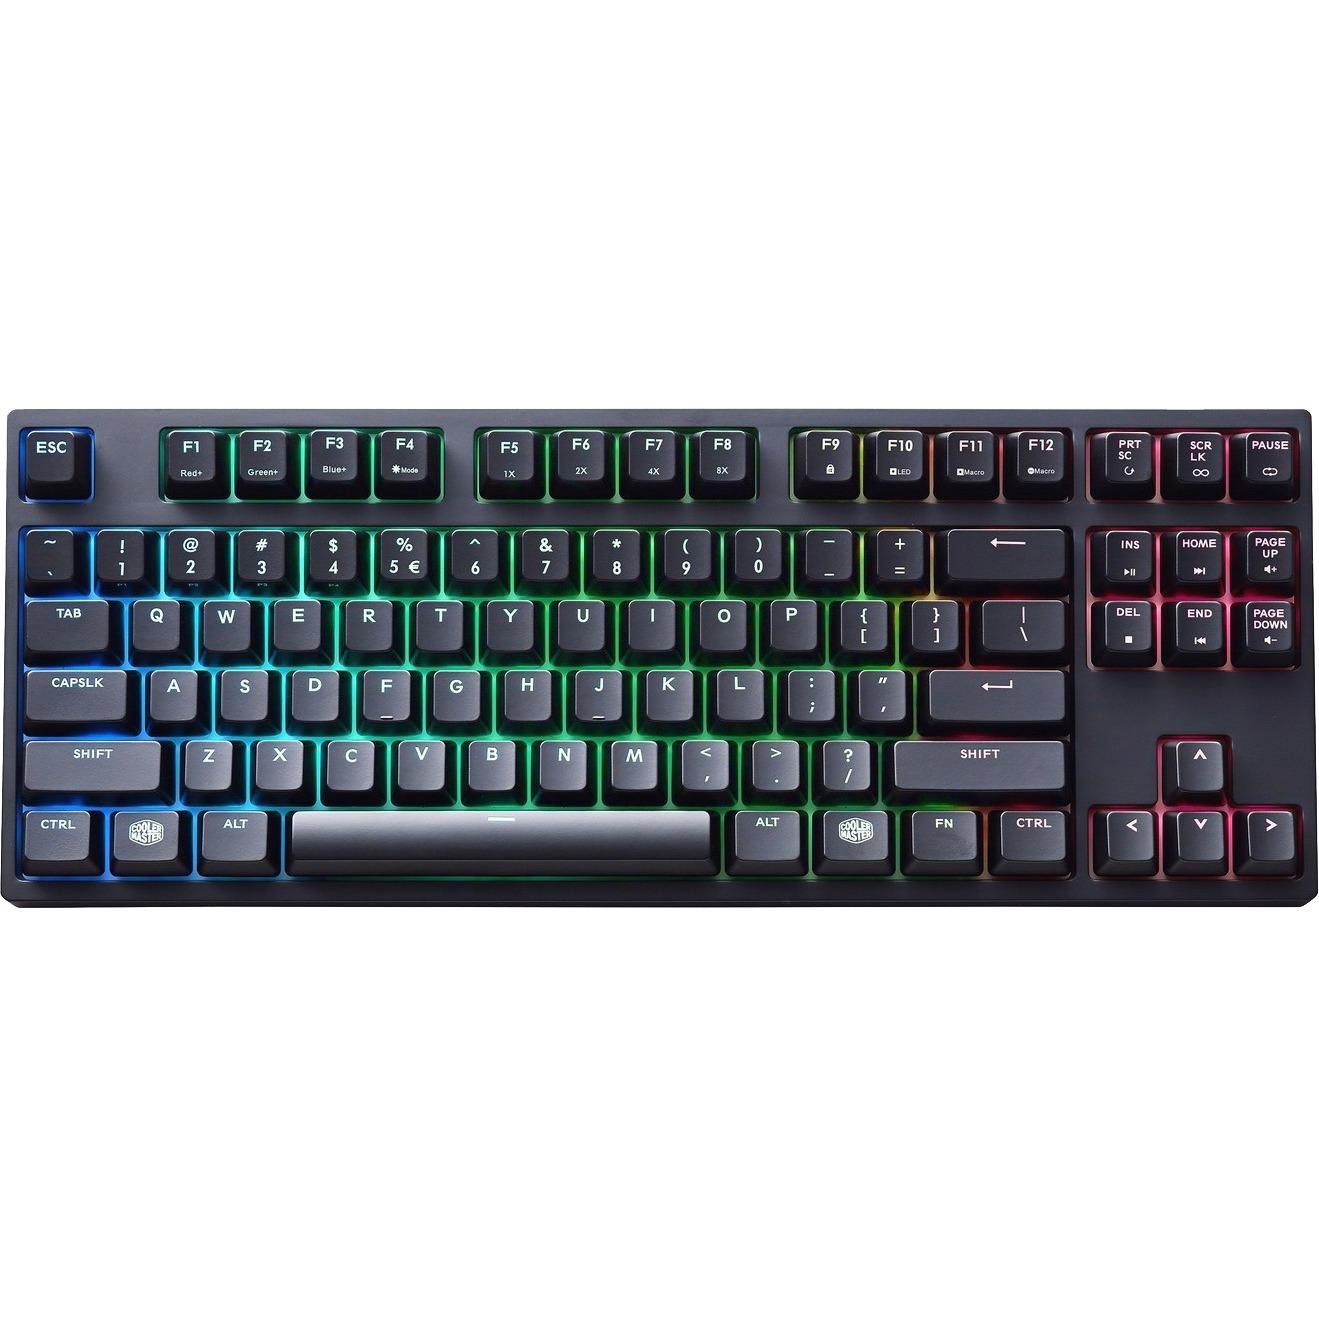 Cooler Master Masterkeys Pro S SGK-6030-KKCM1 Mechanical Keyboard  - Black